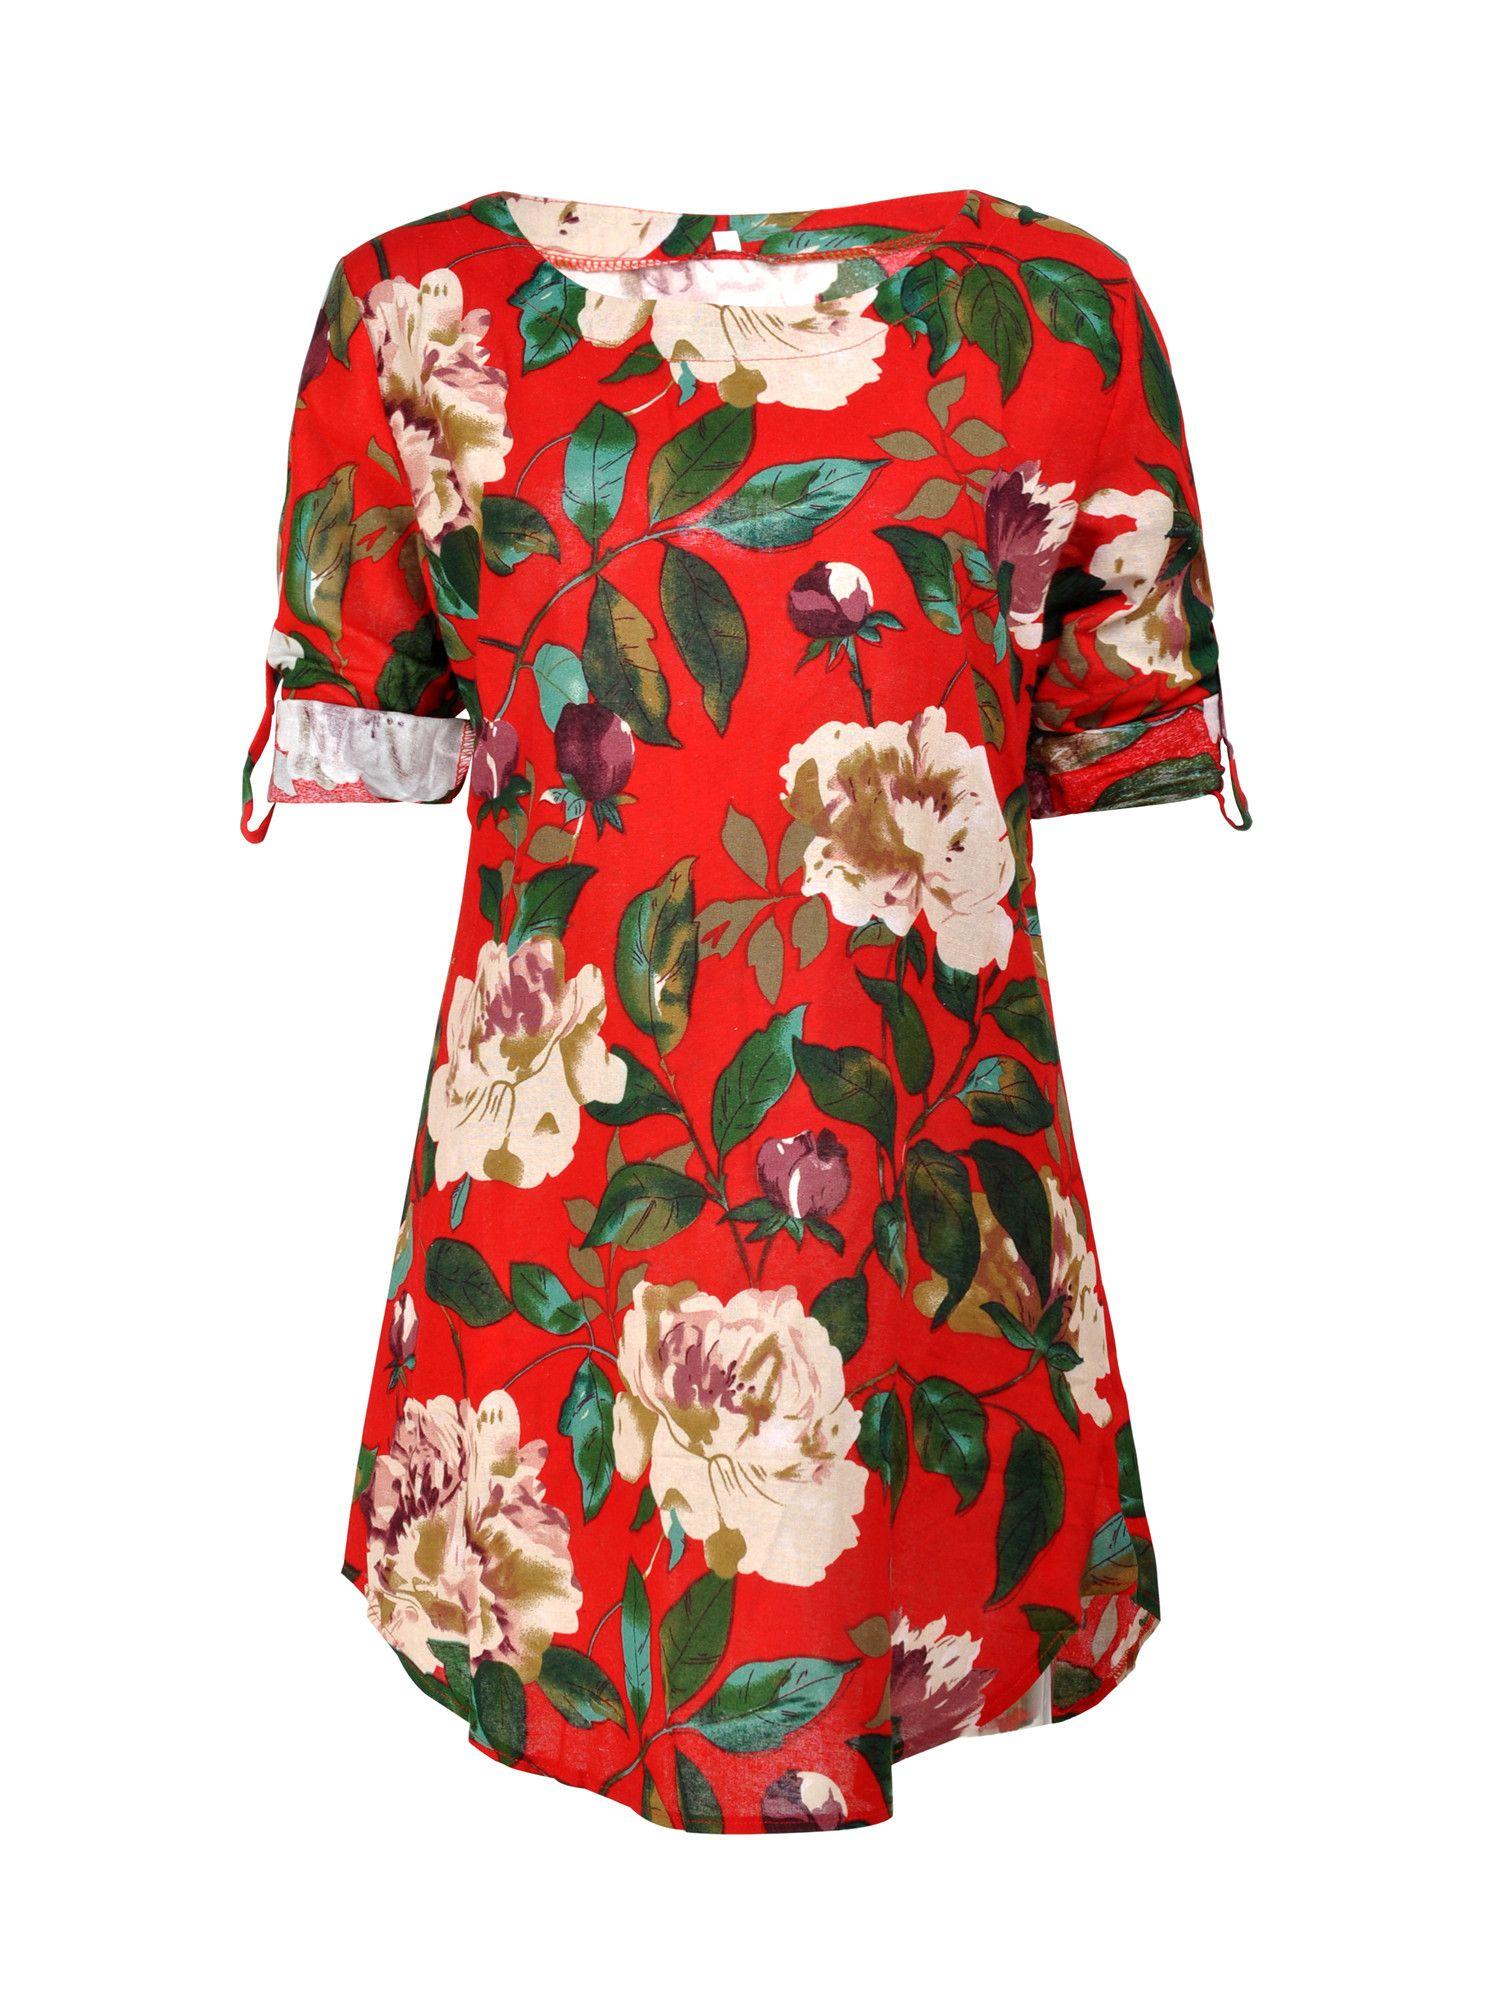 Summer Women Short Sleeve Casual Floral Top Sundress Party Plus Size Mini Dress